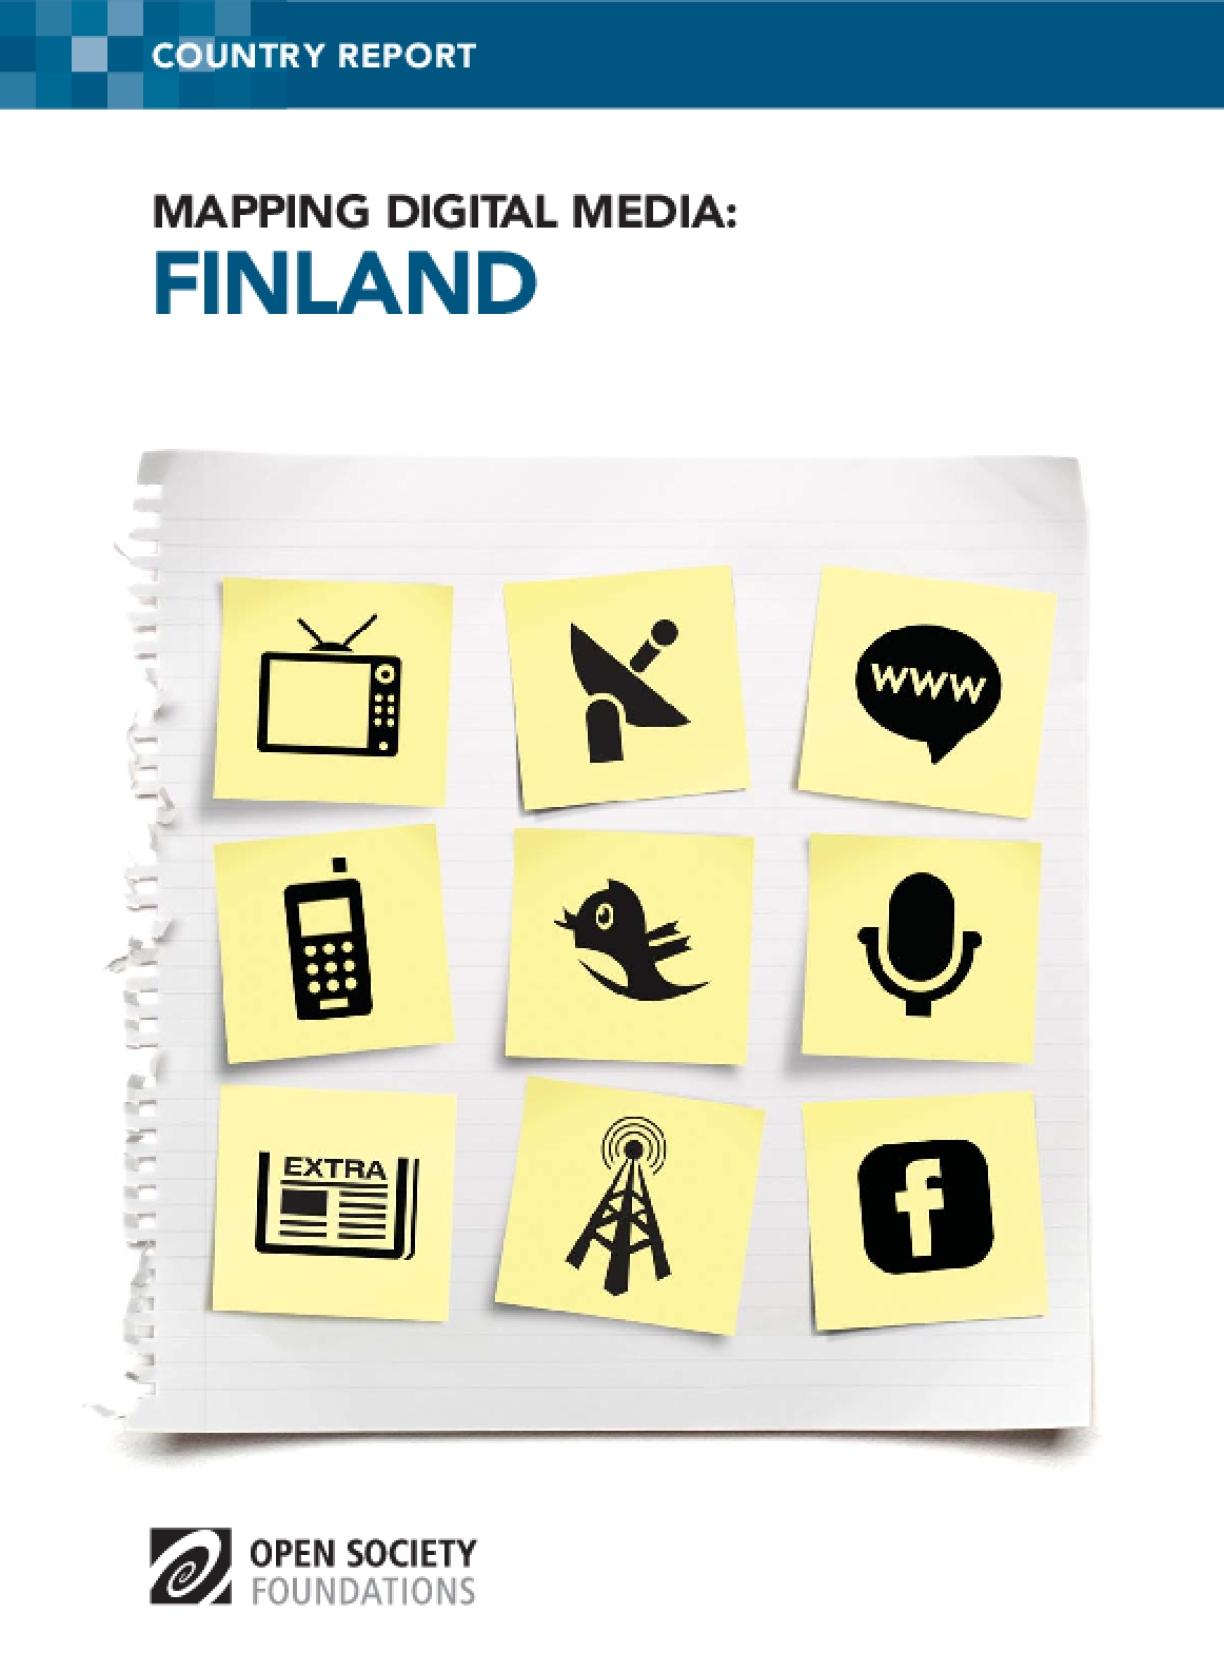 Mapping Digital Media: Finland